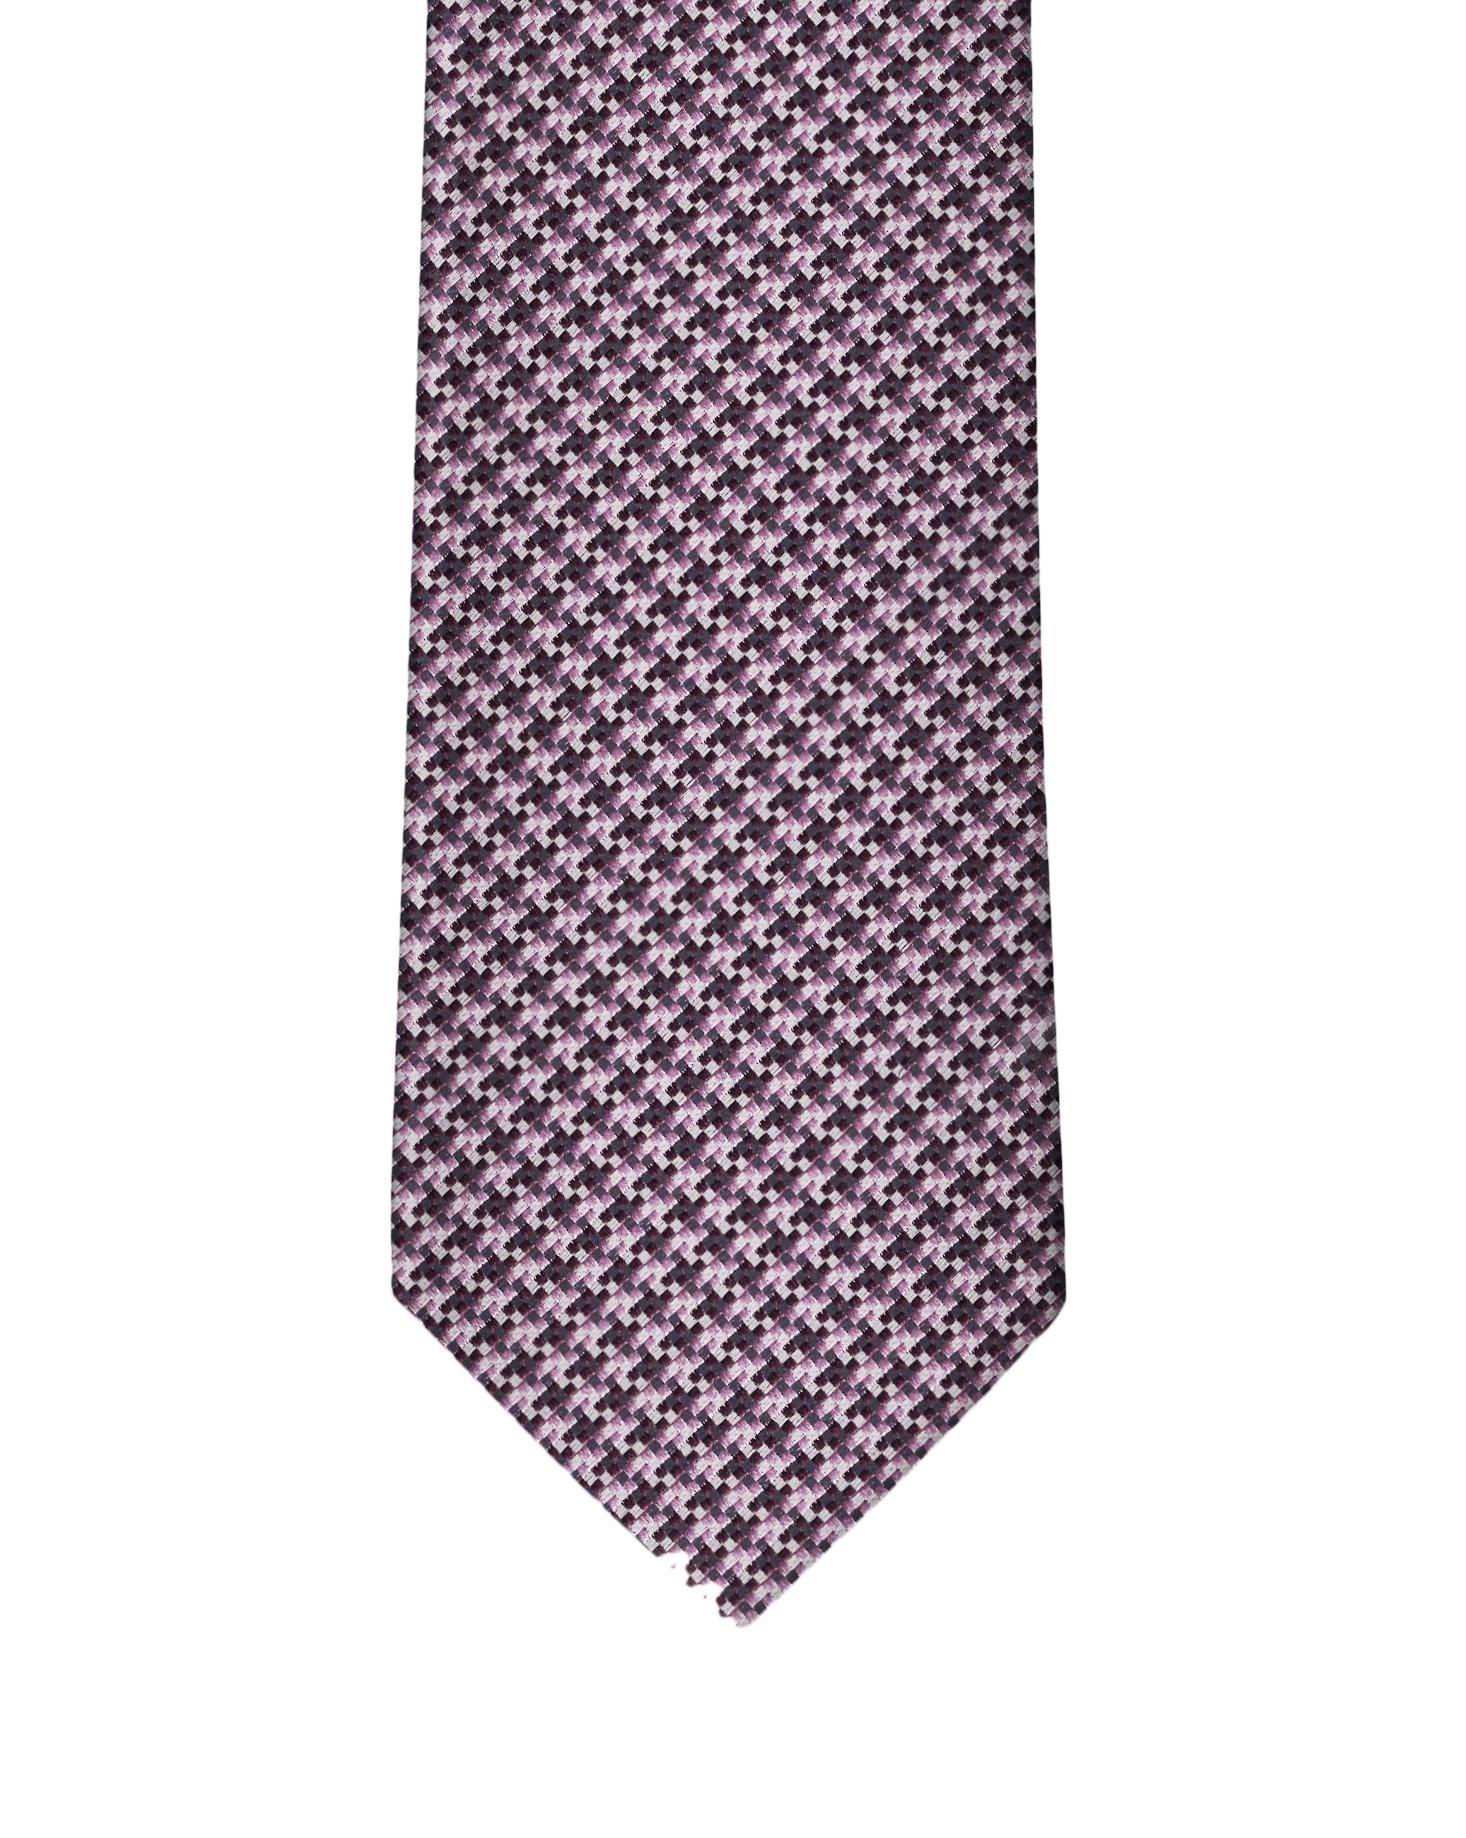 Dk Purple & Mauve Micro Houndstooth Necktie